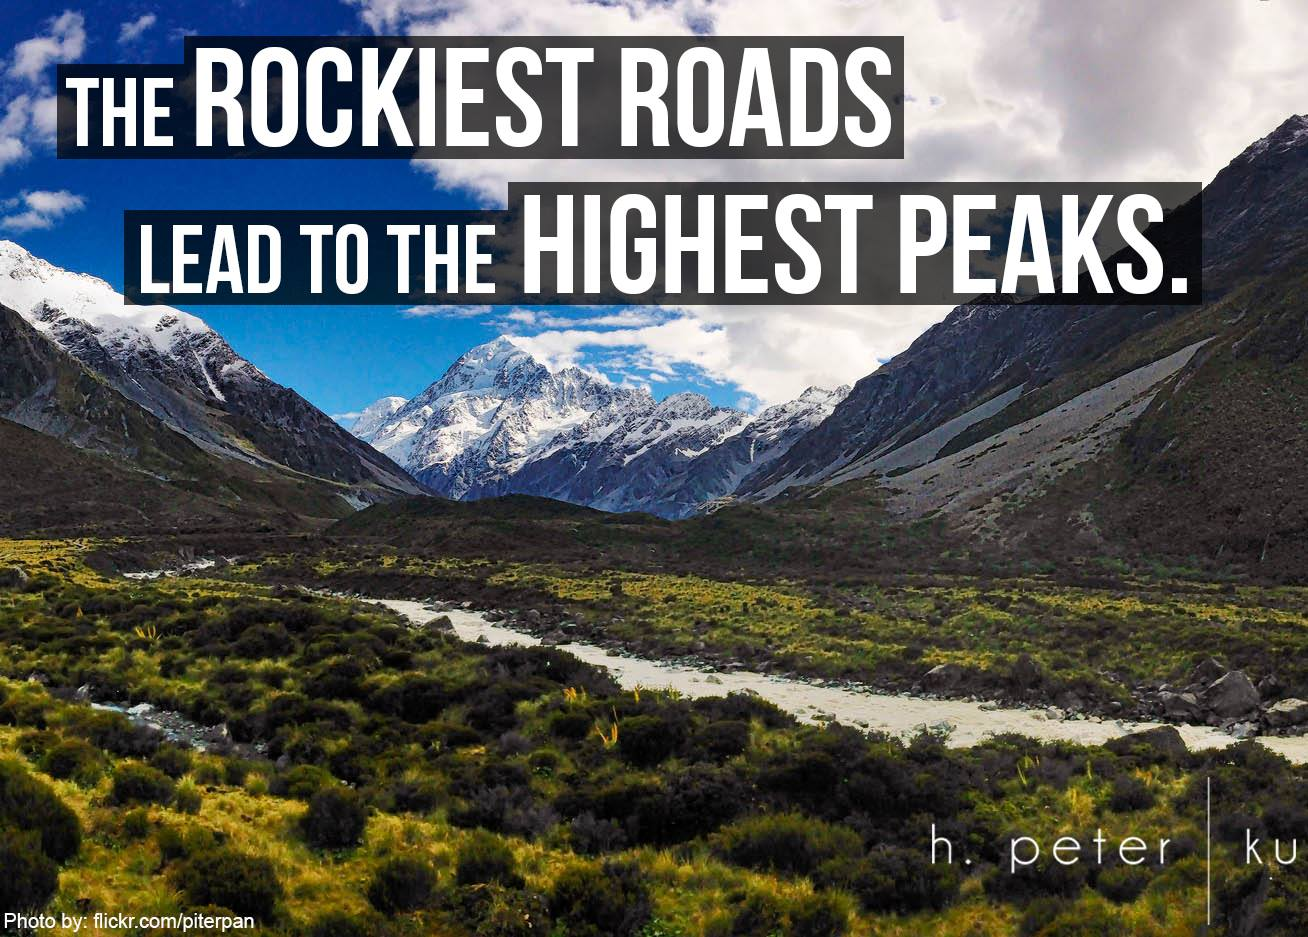 The-rockiest-roads-lead-to-the-highest-peaks